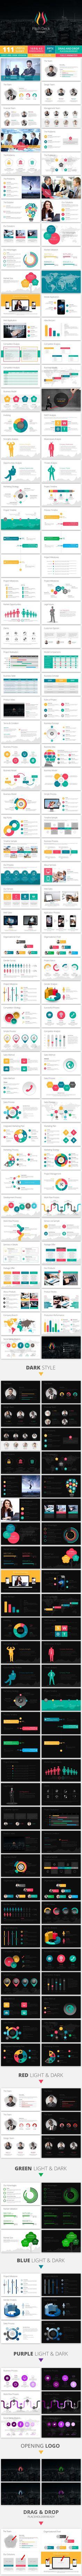 Startup Pitch Deck PowerPoint Template // Inspiration for the EMRLD14 Team // www.emrld14.com